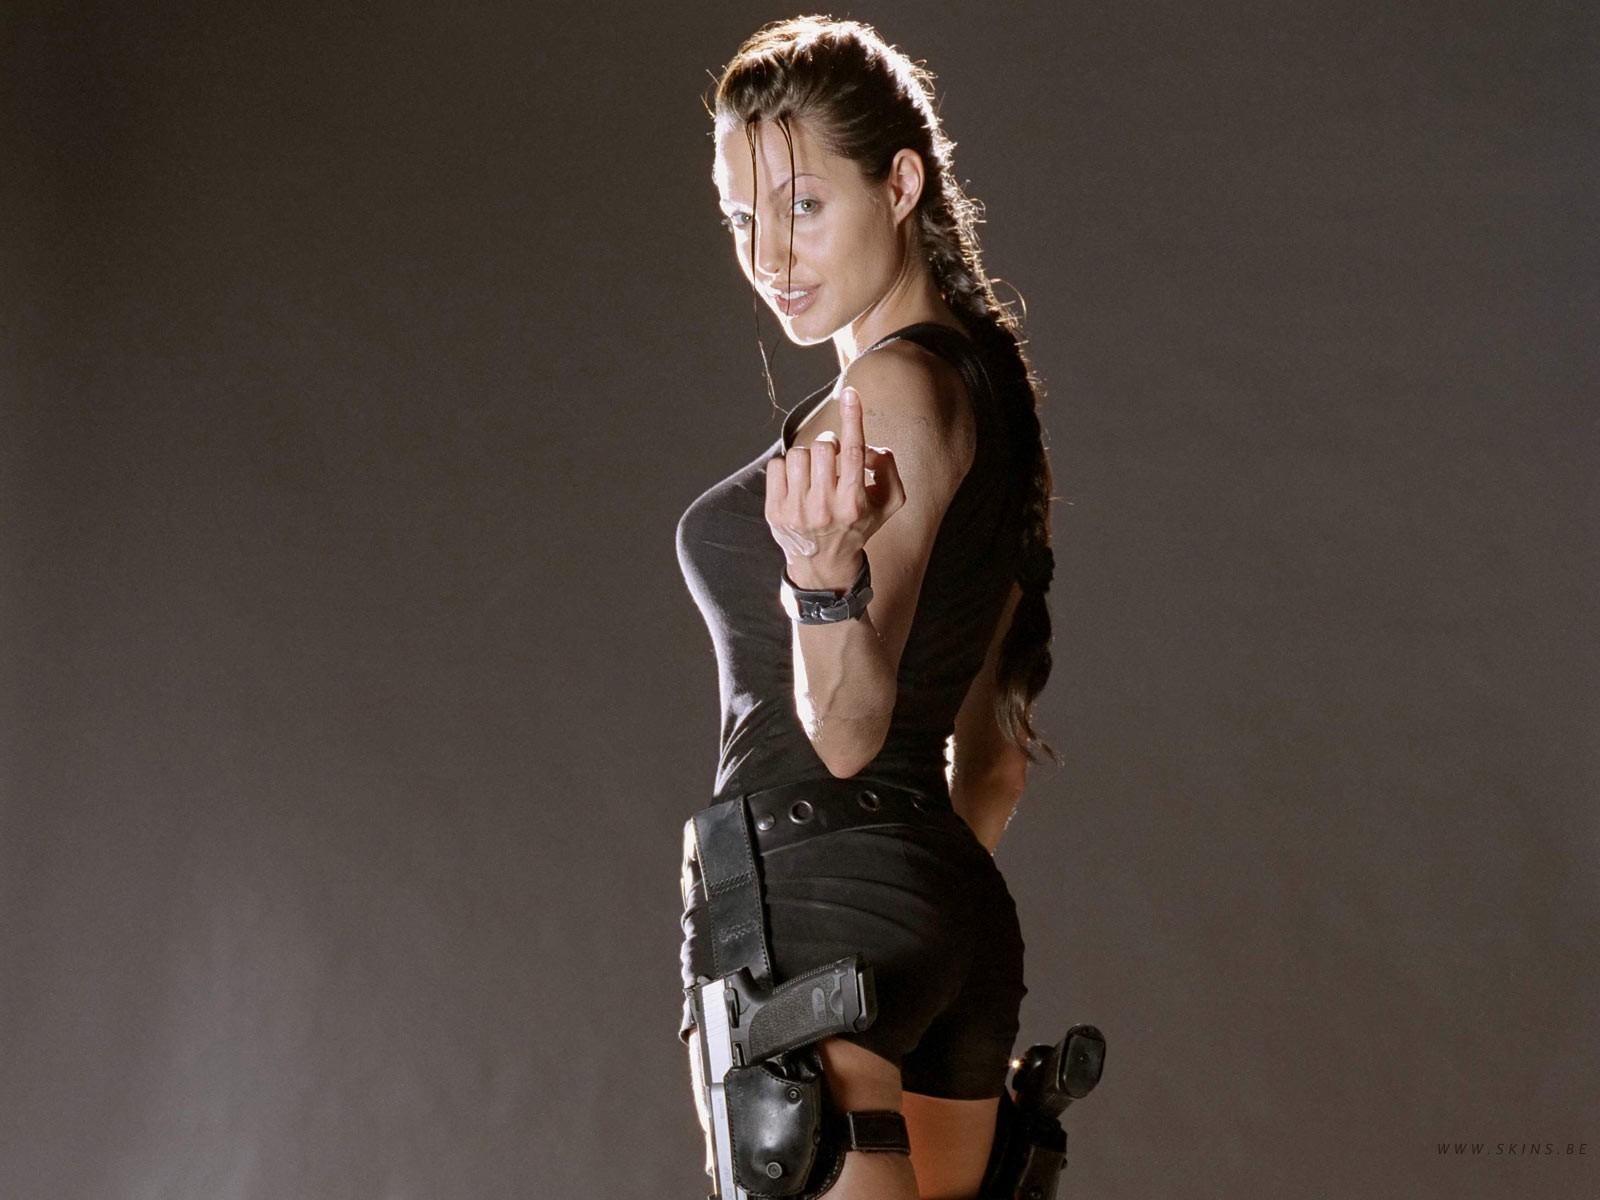 Angelina Jolie Sexi Movie pin on 2 -beauty/angelina jolie